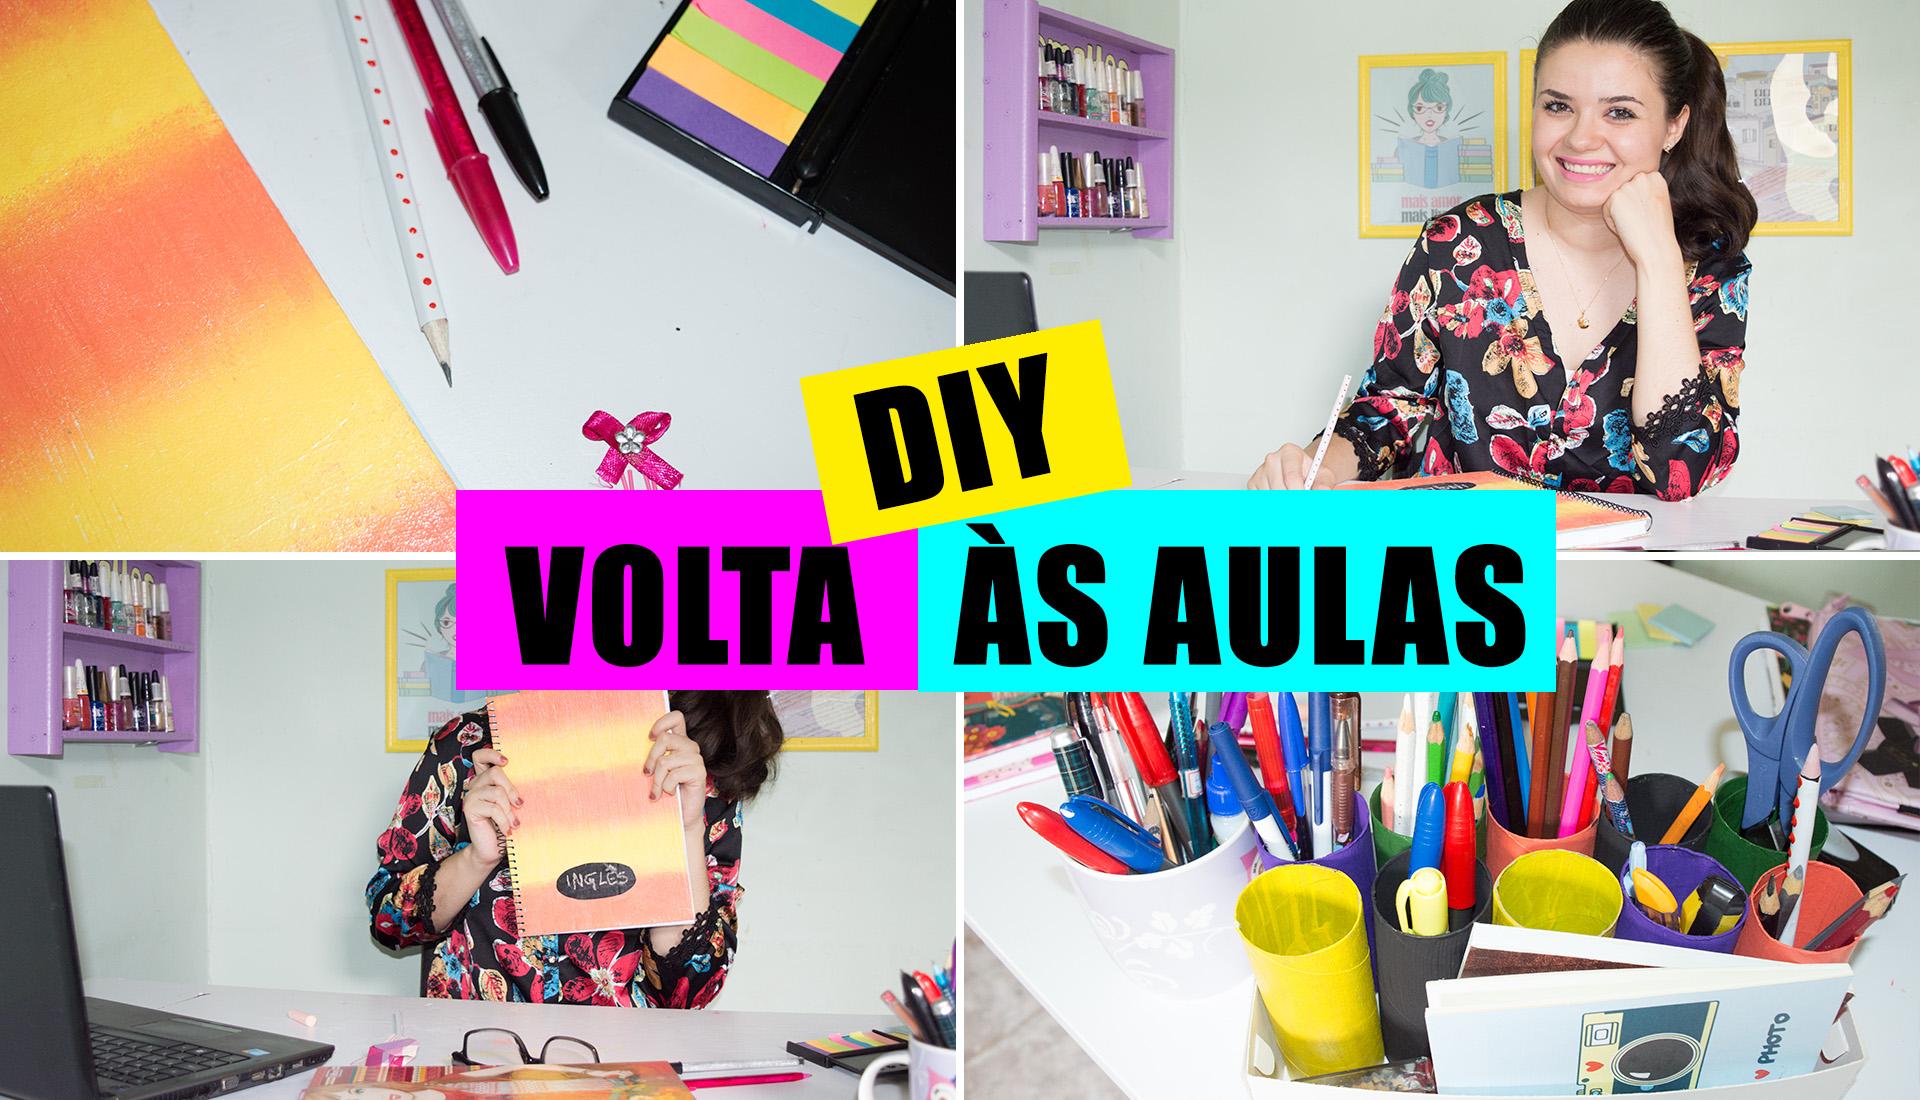 DIY VOLTA ÀS AULAS CAPA YOUTUBE